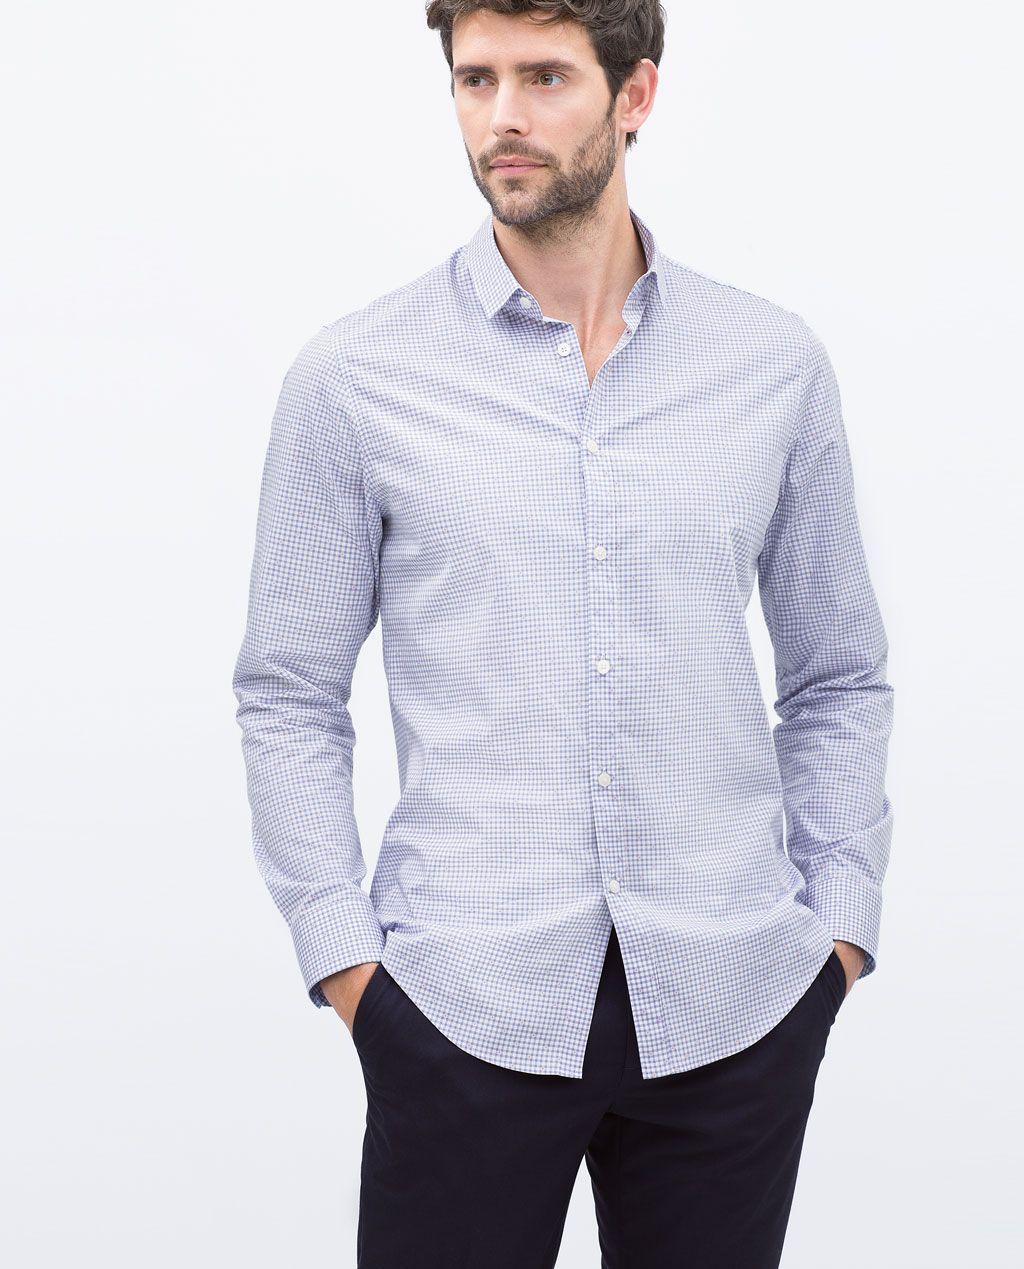 Zara Clothing Men Shirts